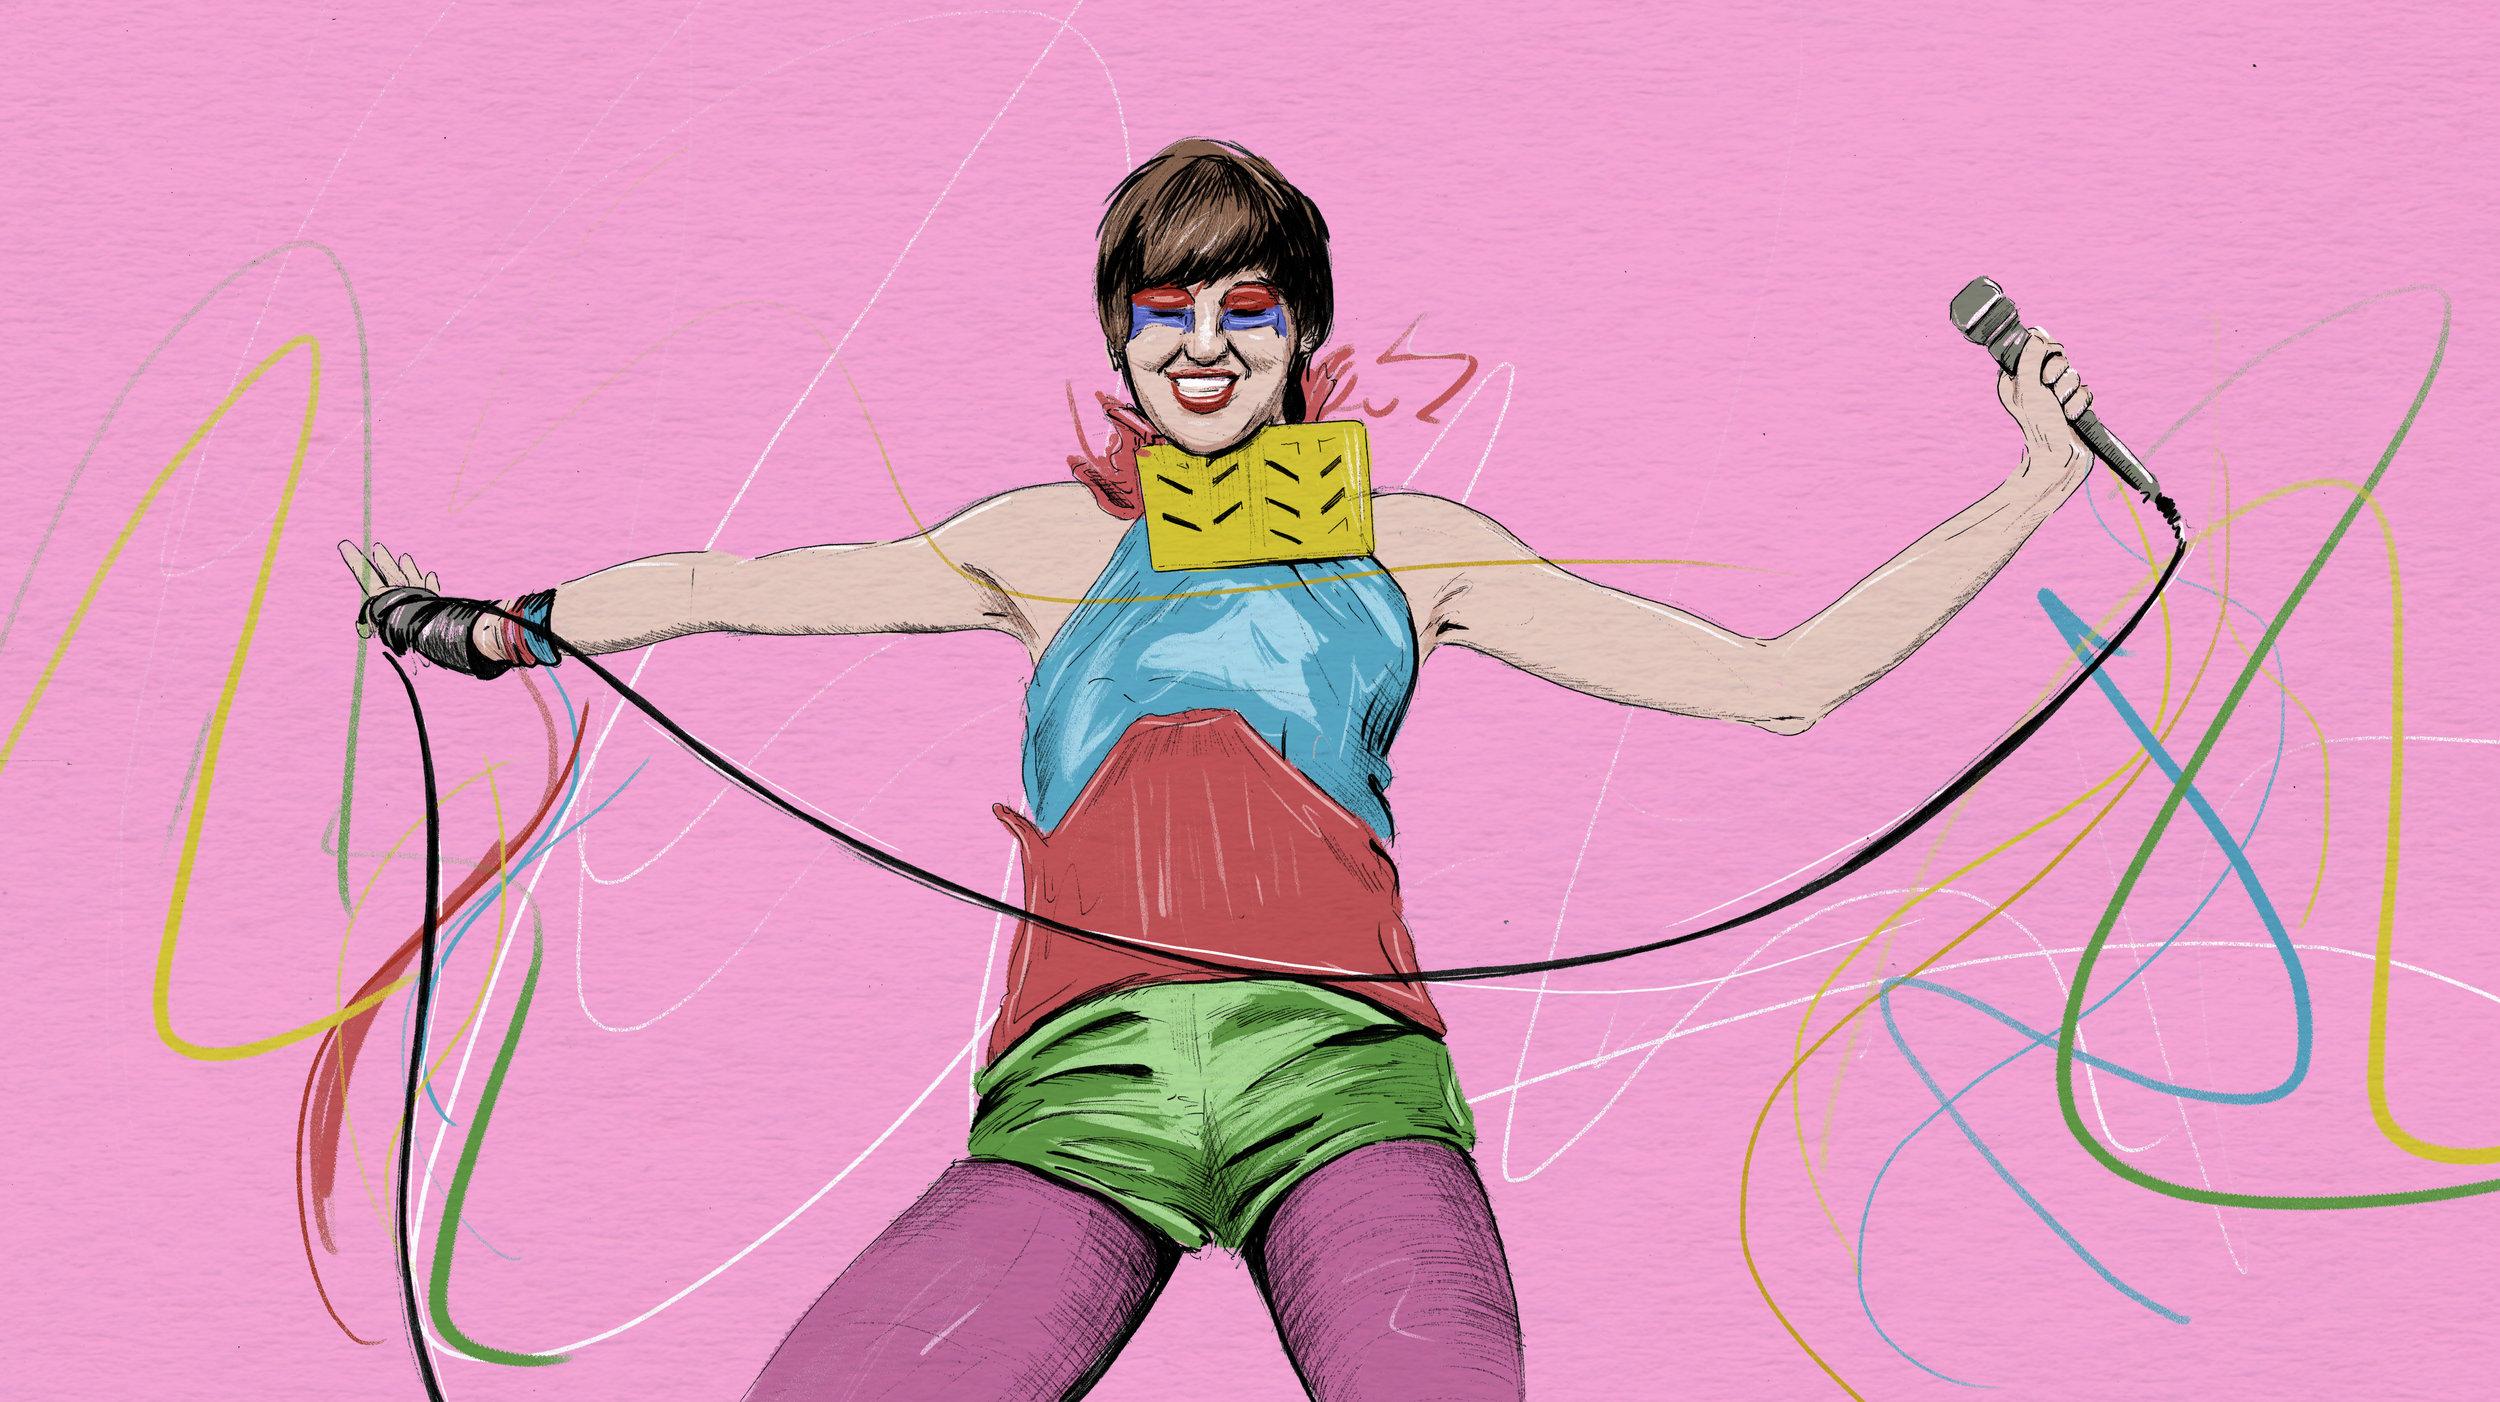 Karen O Is Indie Rock's Beating Heart by Sarah MacDonald